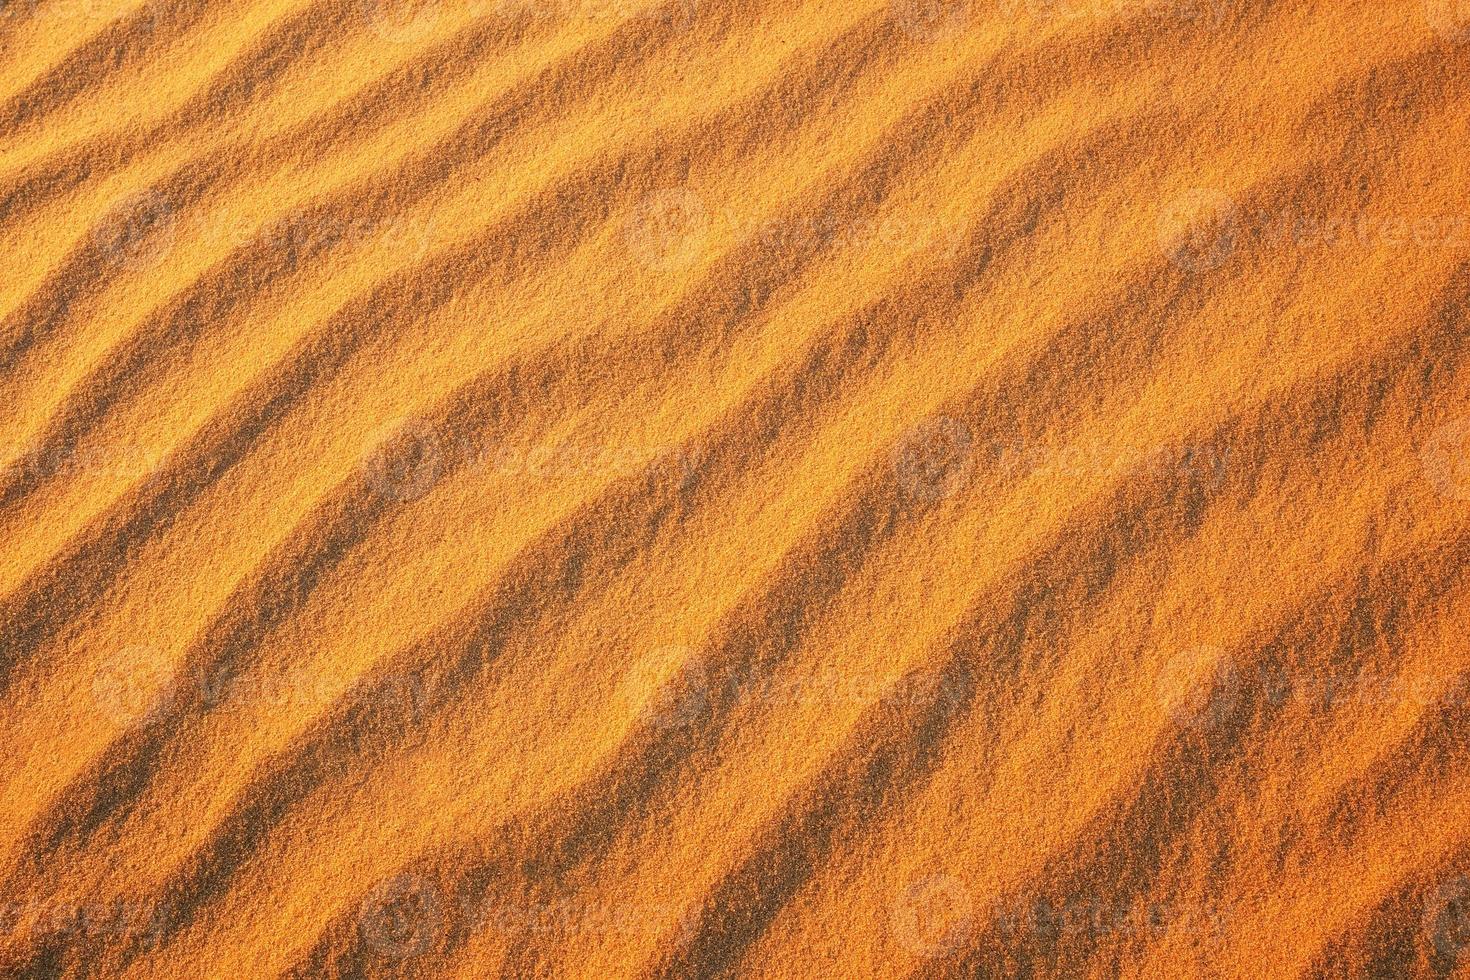 Fondo de arena del desierto. foto